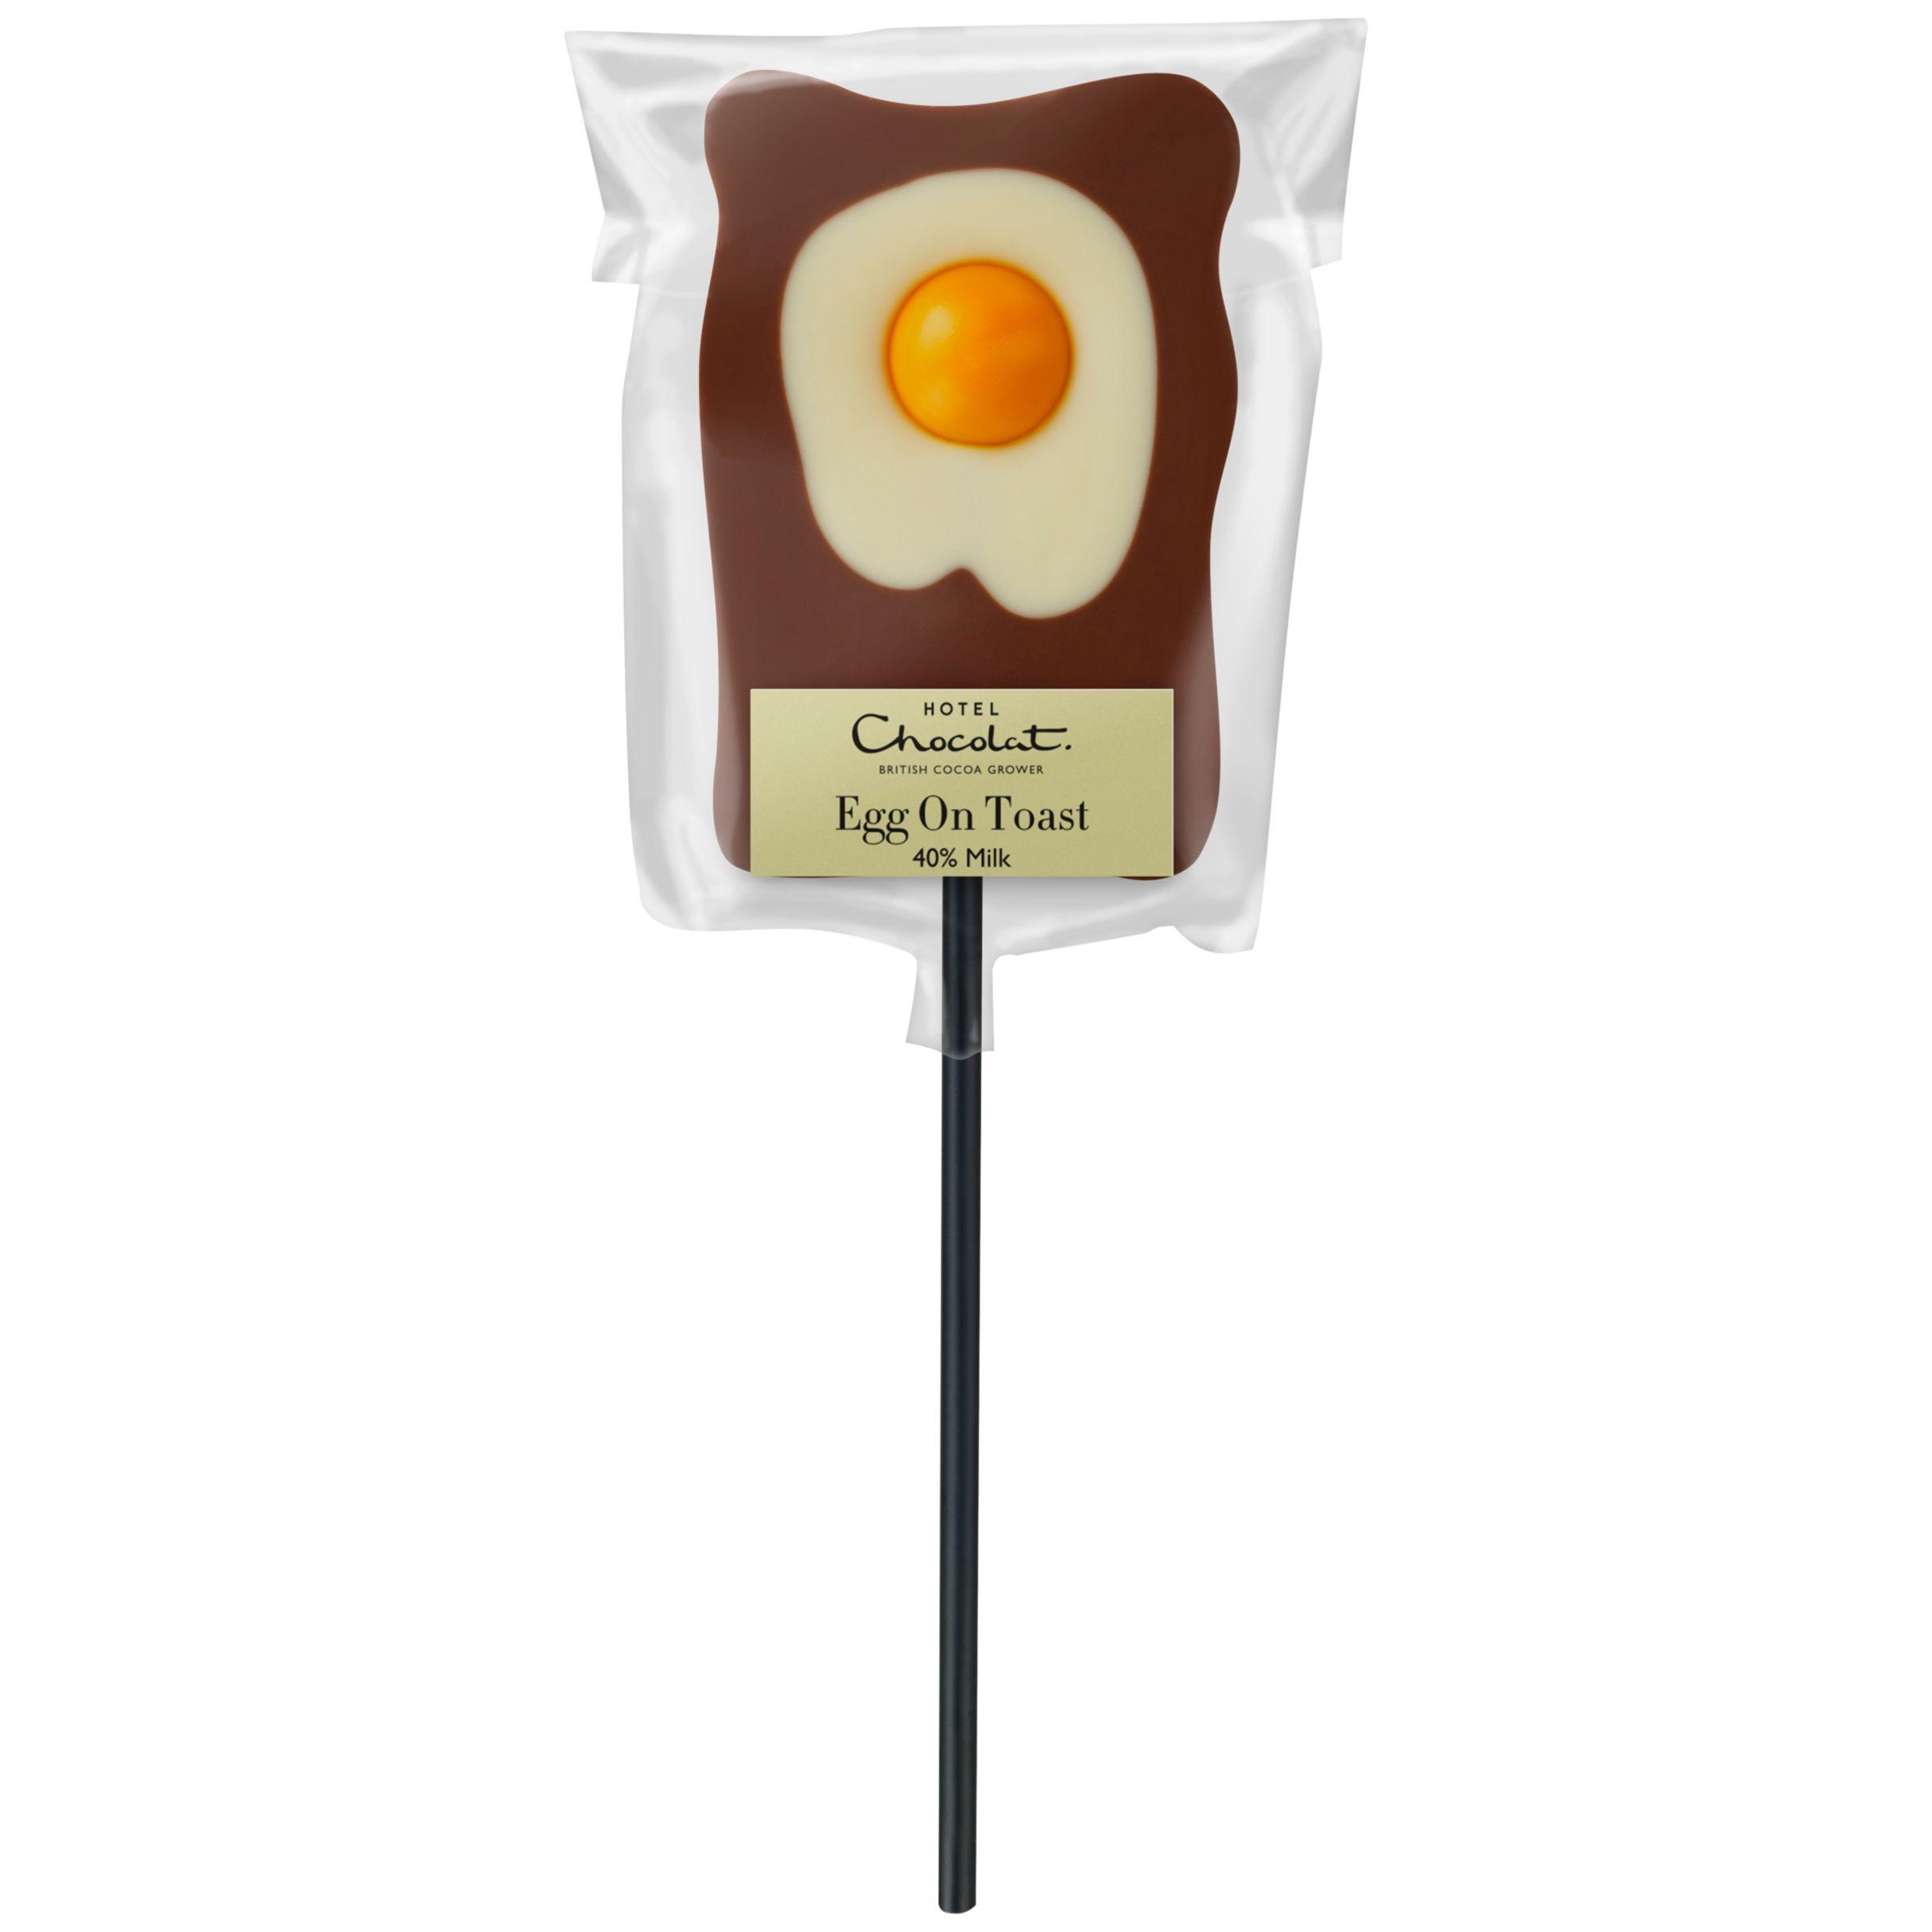 Hotel Chocolat Hotel Chocolat 'Egg On Toast' Milk Chocolate Lick, 40g